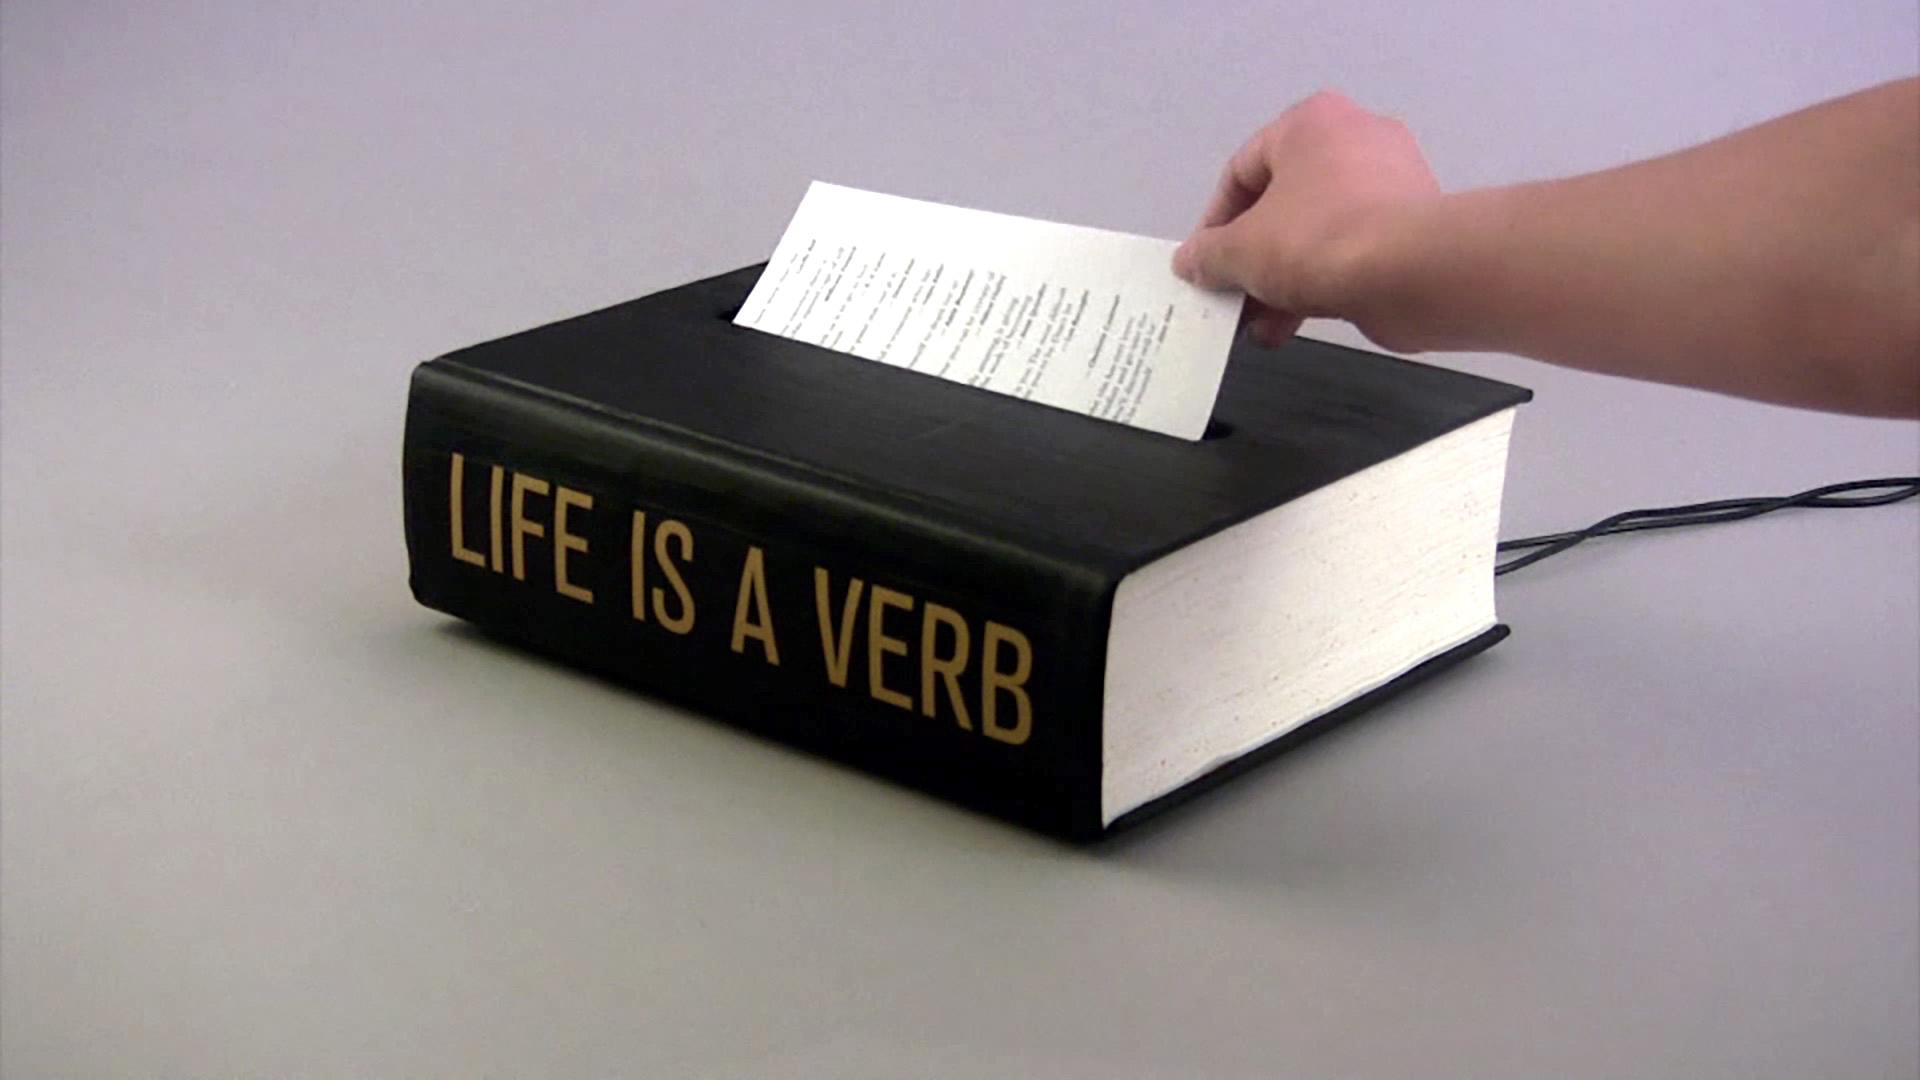 ©2012, Jing Zhou, Life is a Verb: The Book of Spoken Wisdom